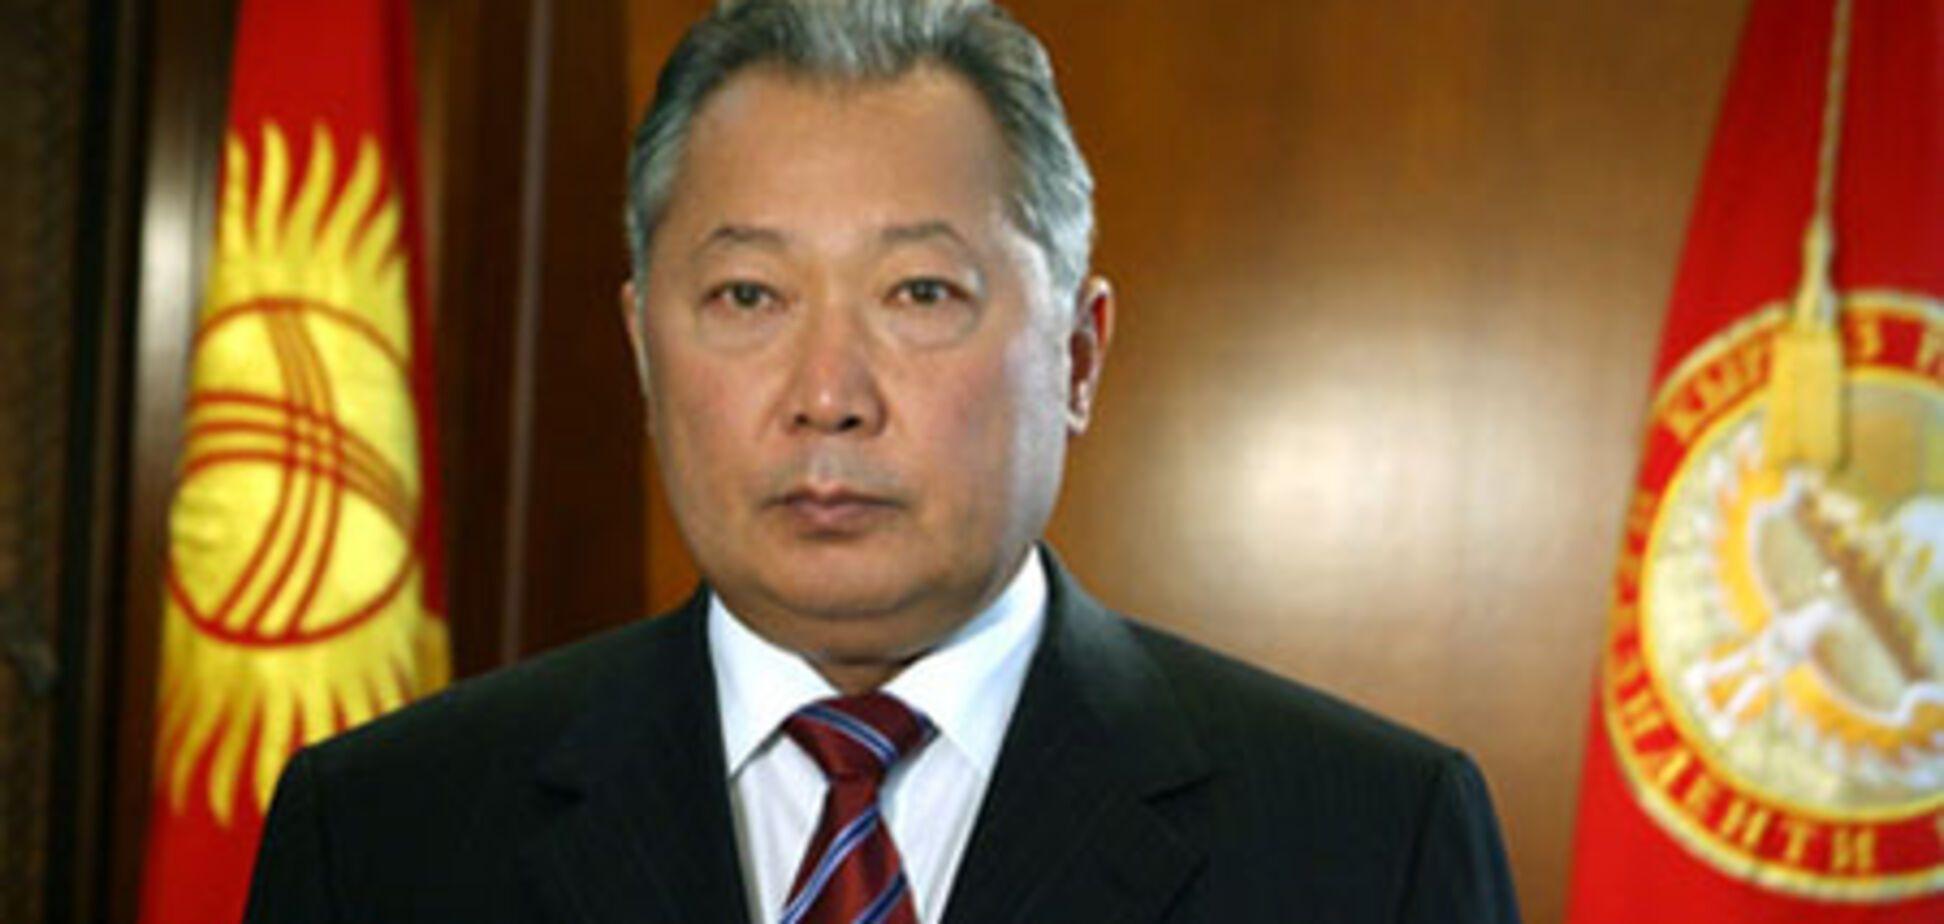 Лукашенко влаштував екс-президента Киргизії на роботу